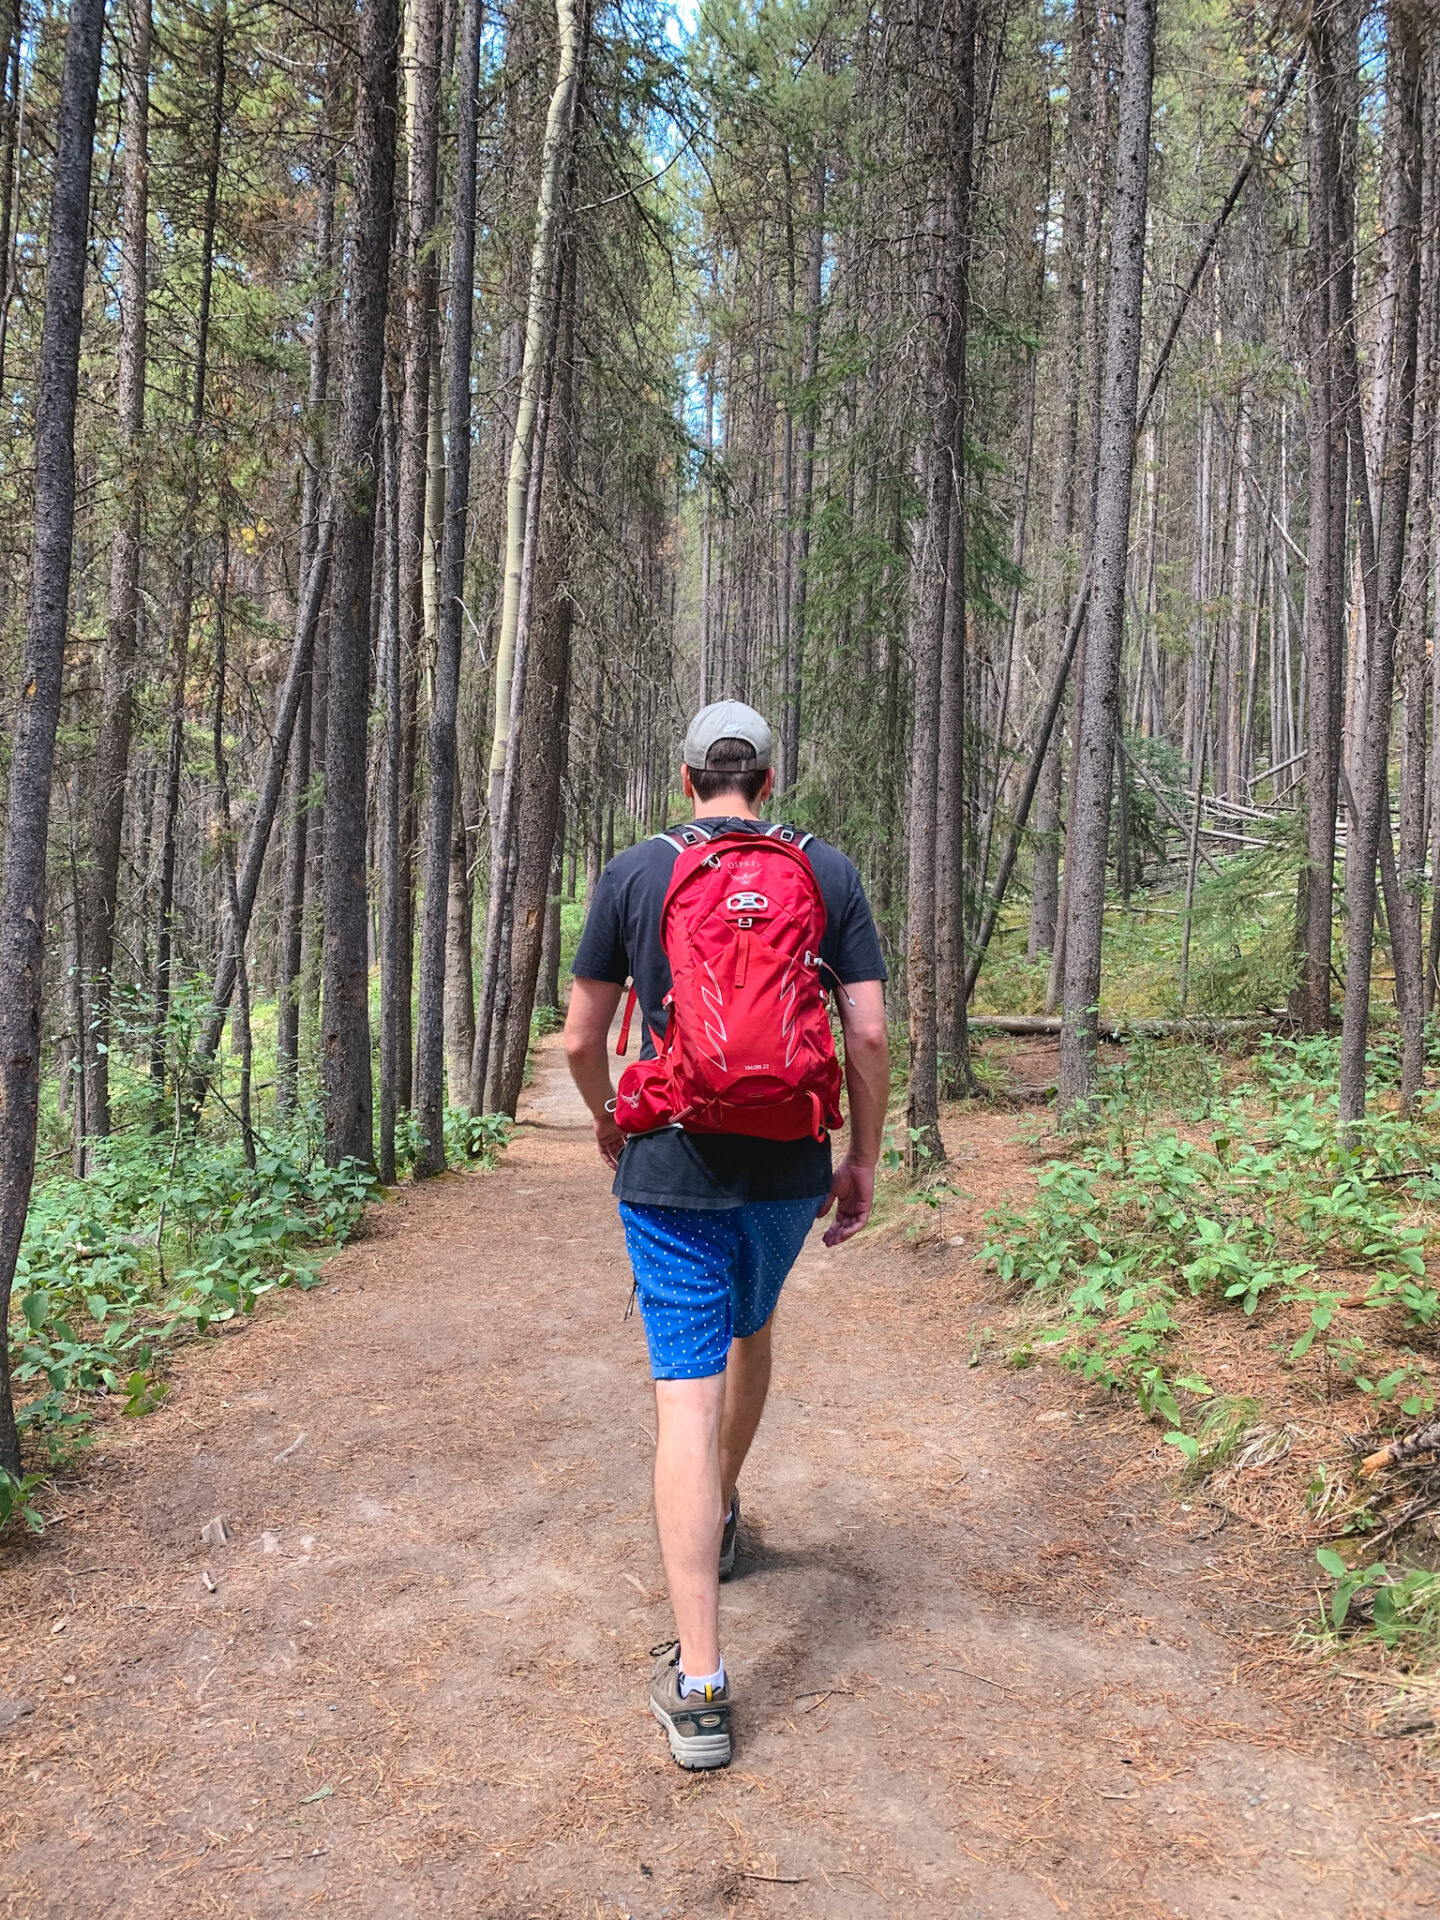 Johnston Canyon & Ink Pots hike in Banff, Alberta